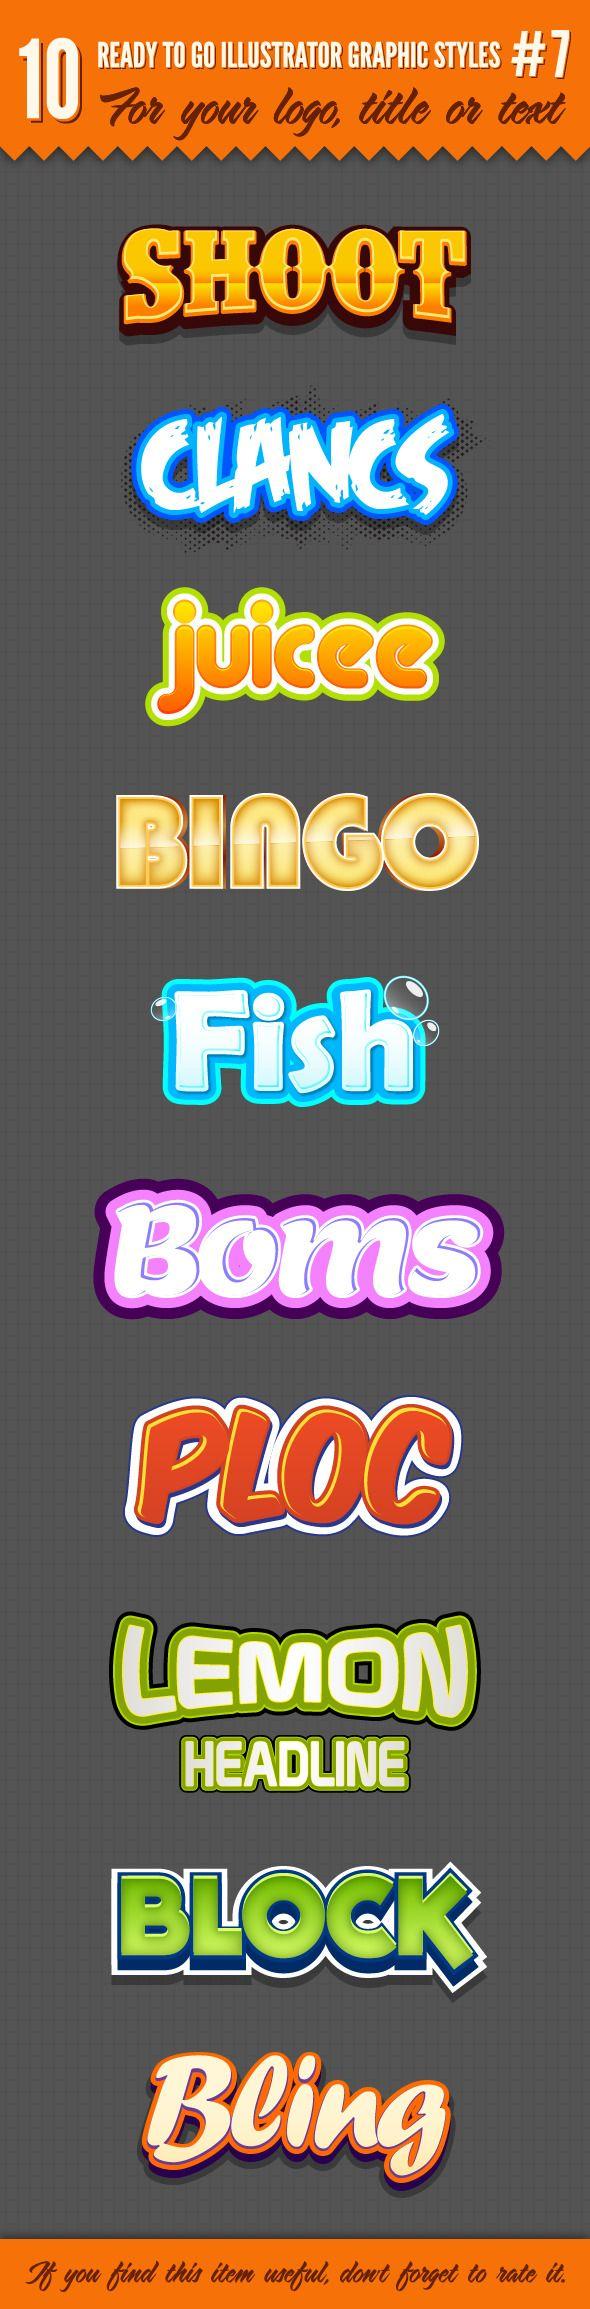 10 Logo Graphic Styles #7